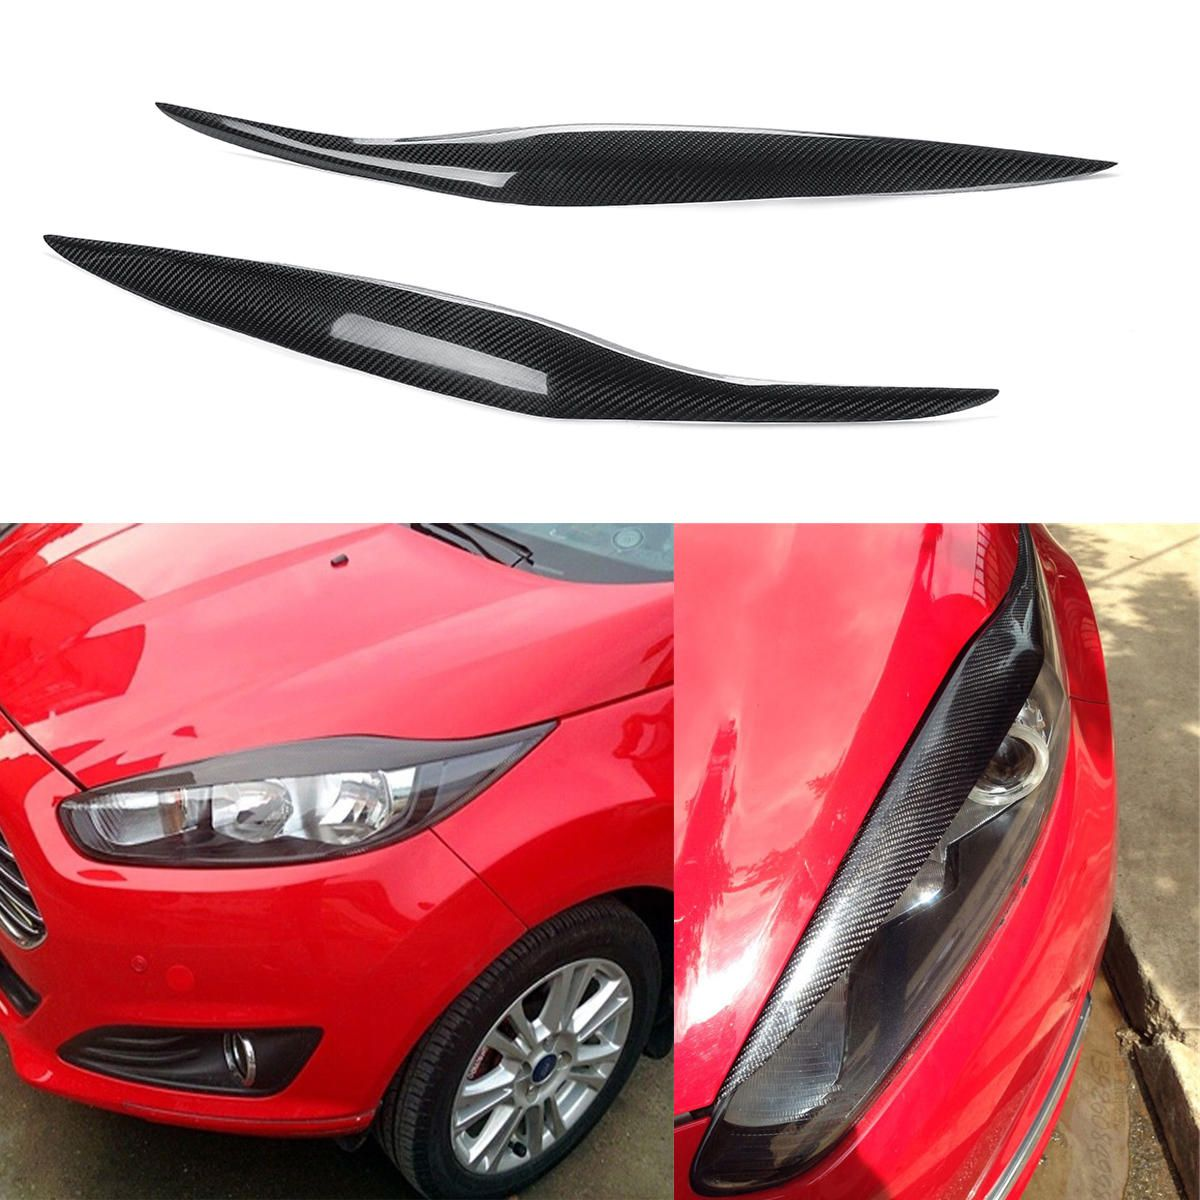 Carbon Fiber Car Headlight Eyebrow Eyelids For Ford Fiesta Mk7 5 2012 2017 Mk8 2013 2016 Car Headlights Ford Fiesta Carbon Fiber